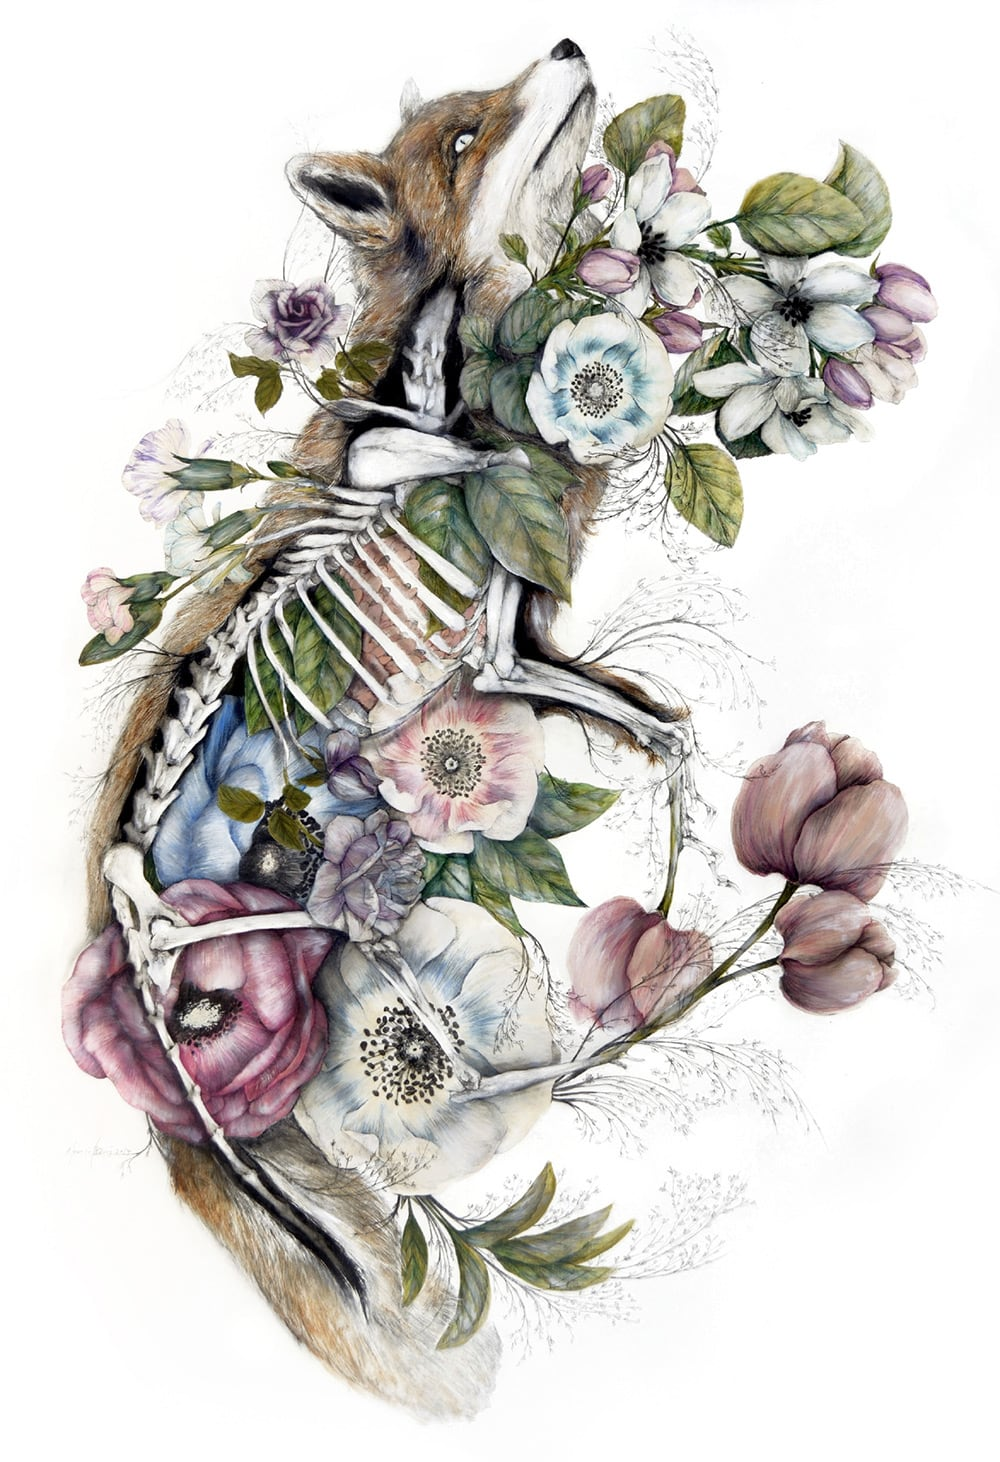 mimesis anatomical paintings flora and fauna nunzio paci fy 3